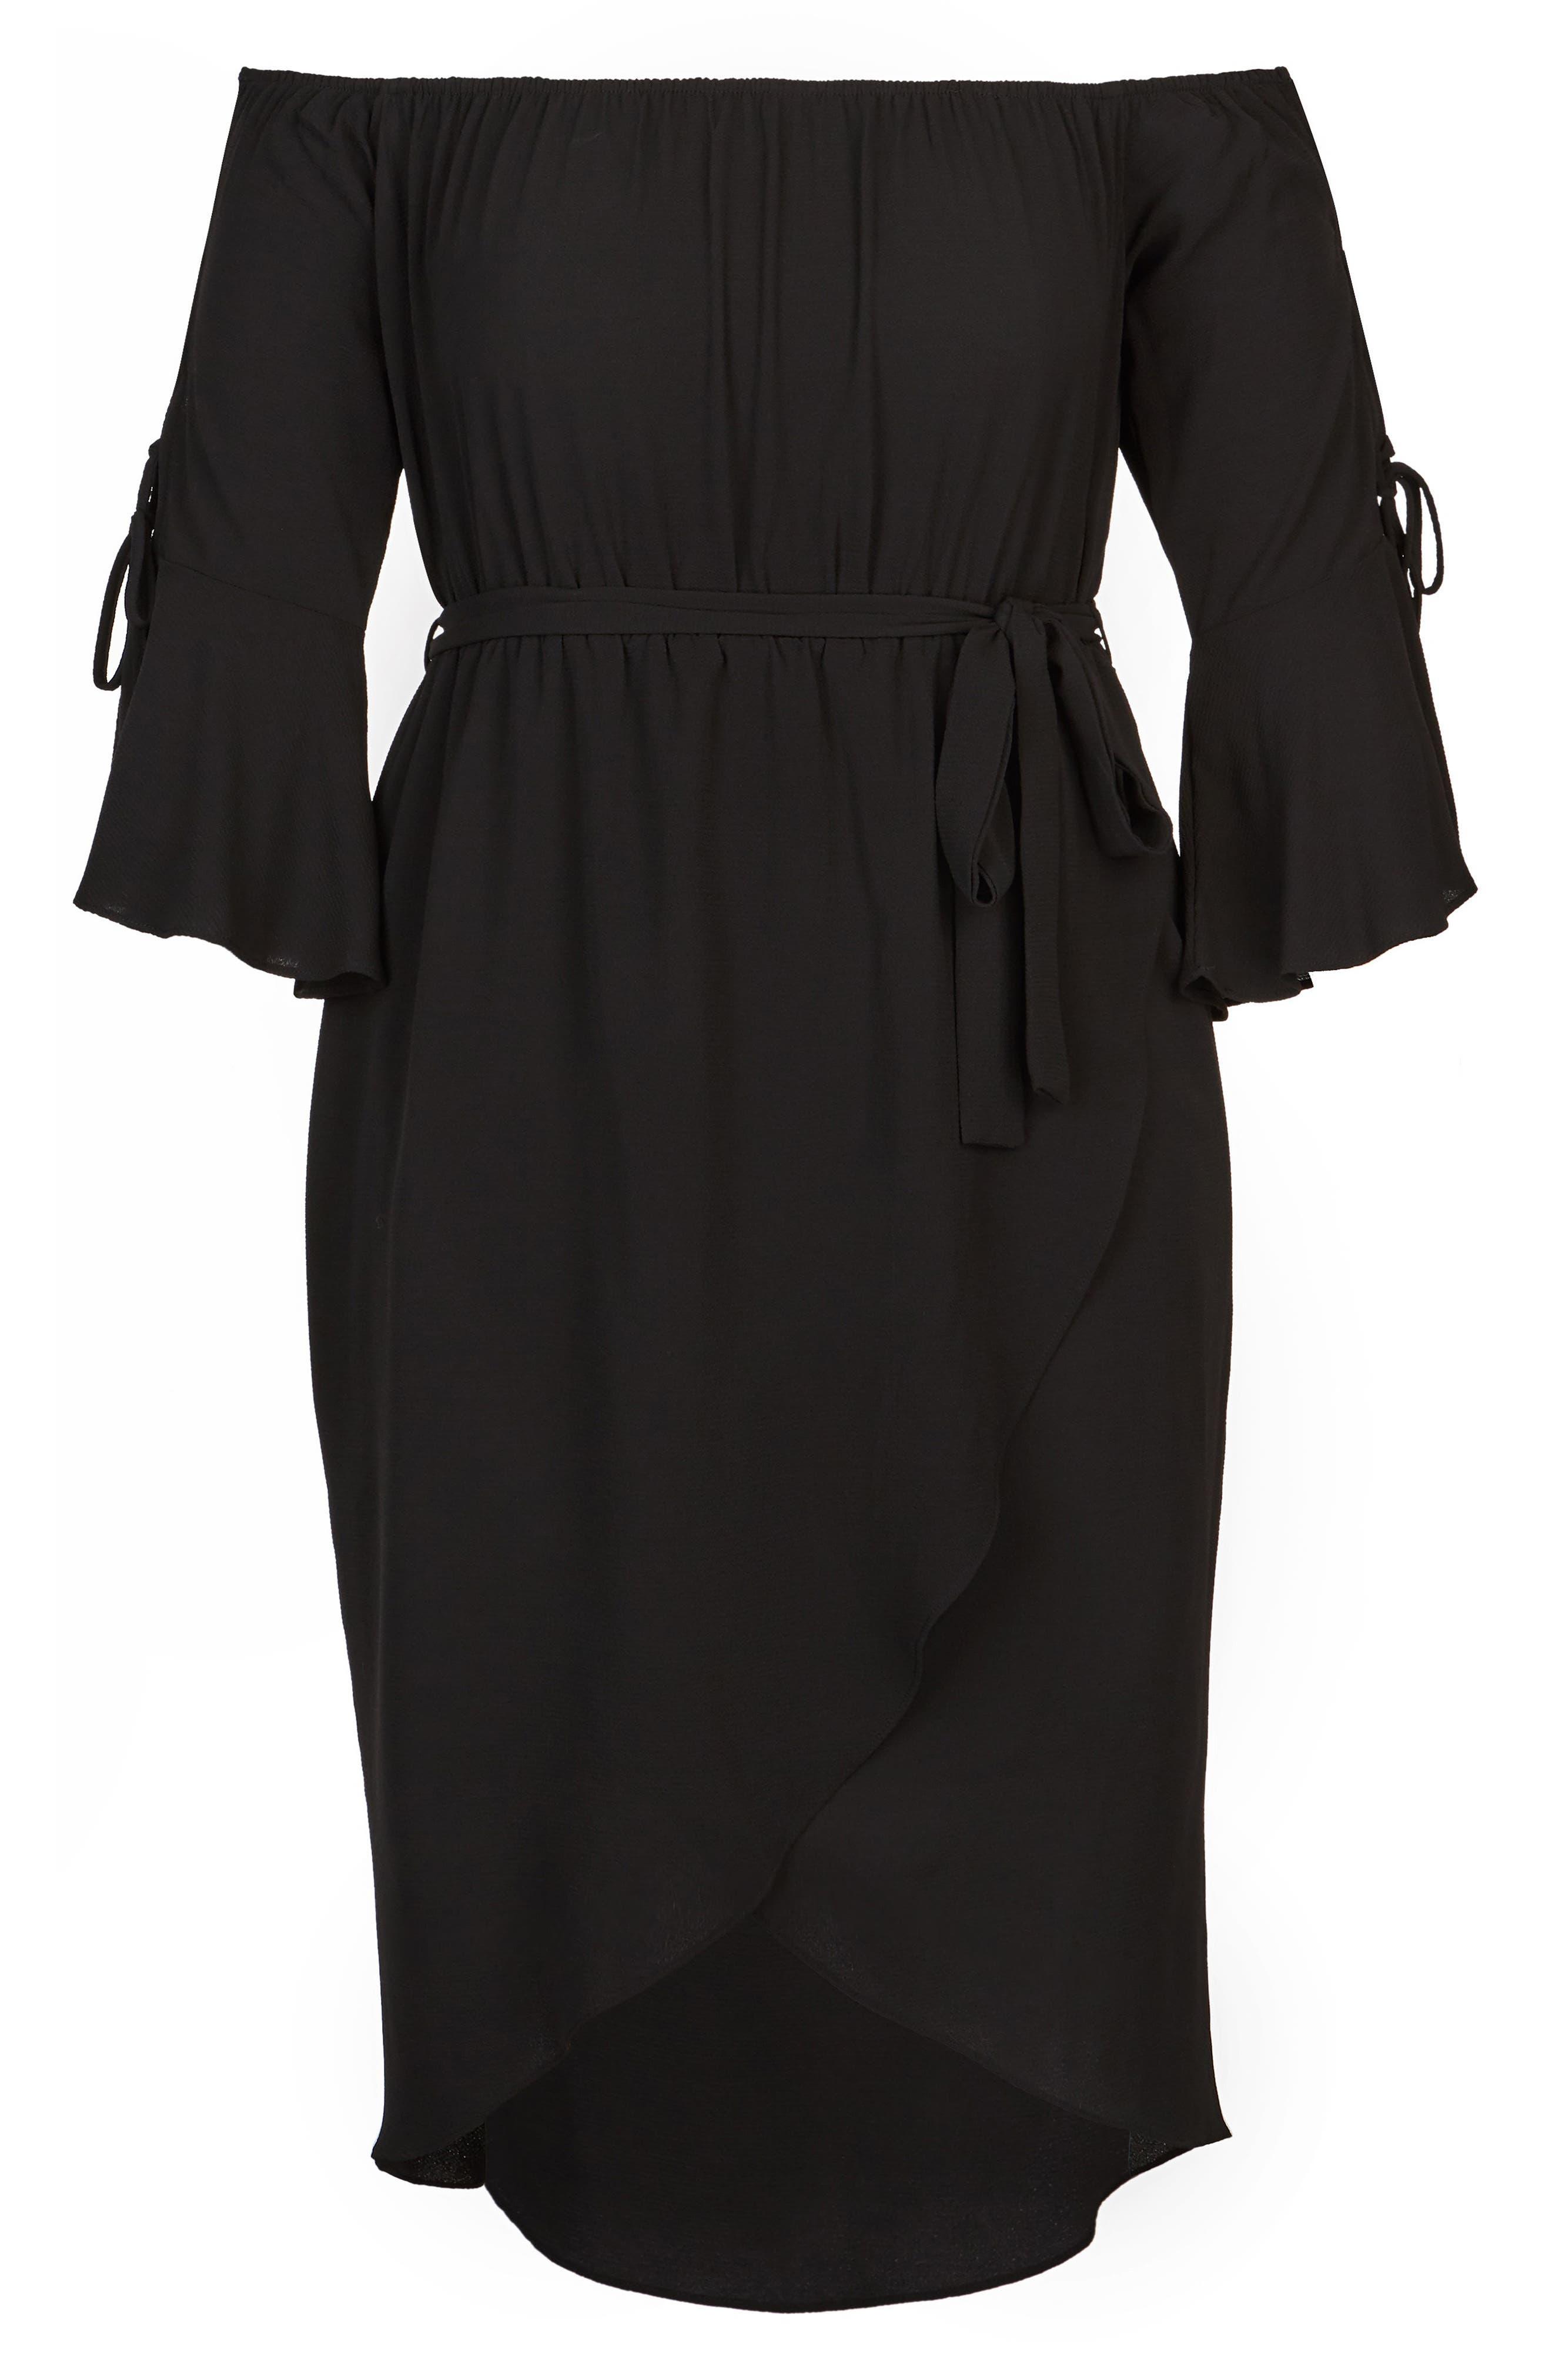 Lace Bell Sleeve Off the Shoulder Midi Dress,                             Alternate thumbnail 3, color,                             Black